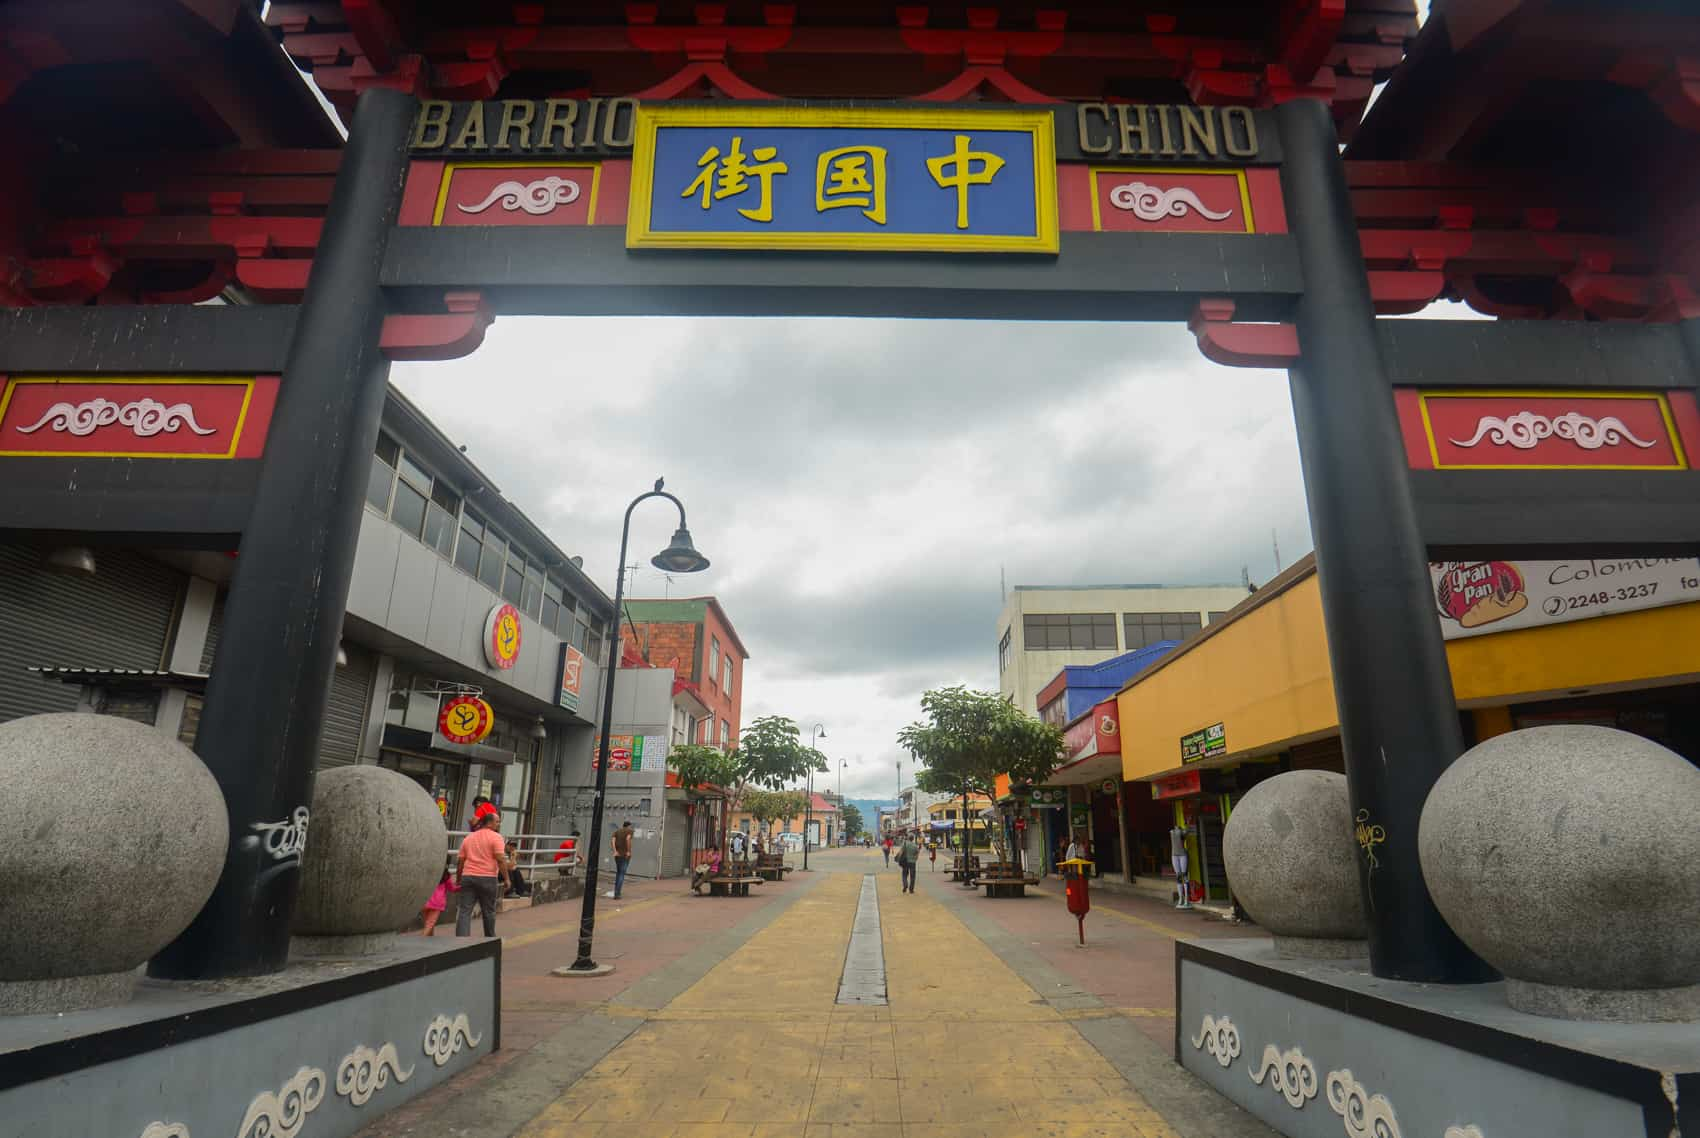 Barrio Chino archway